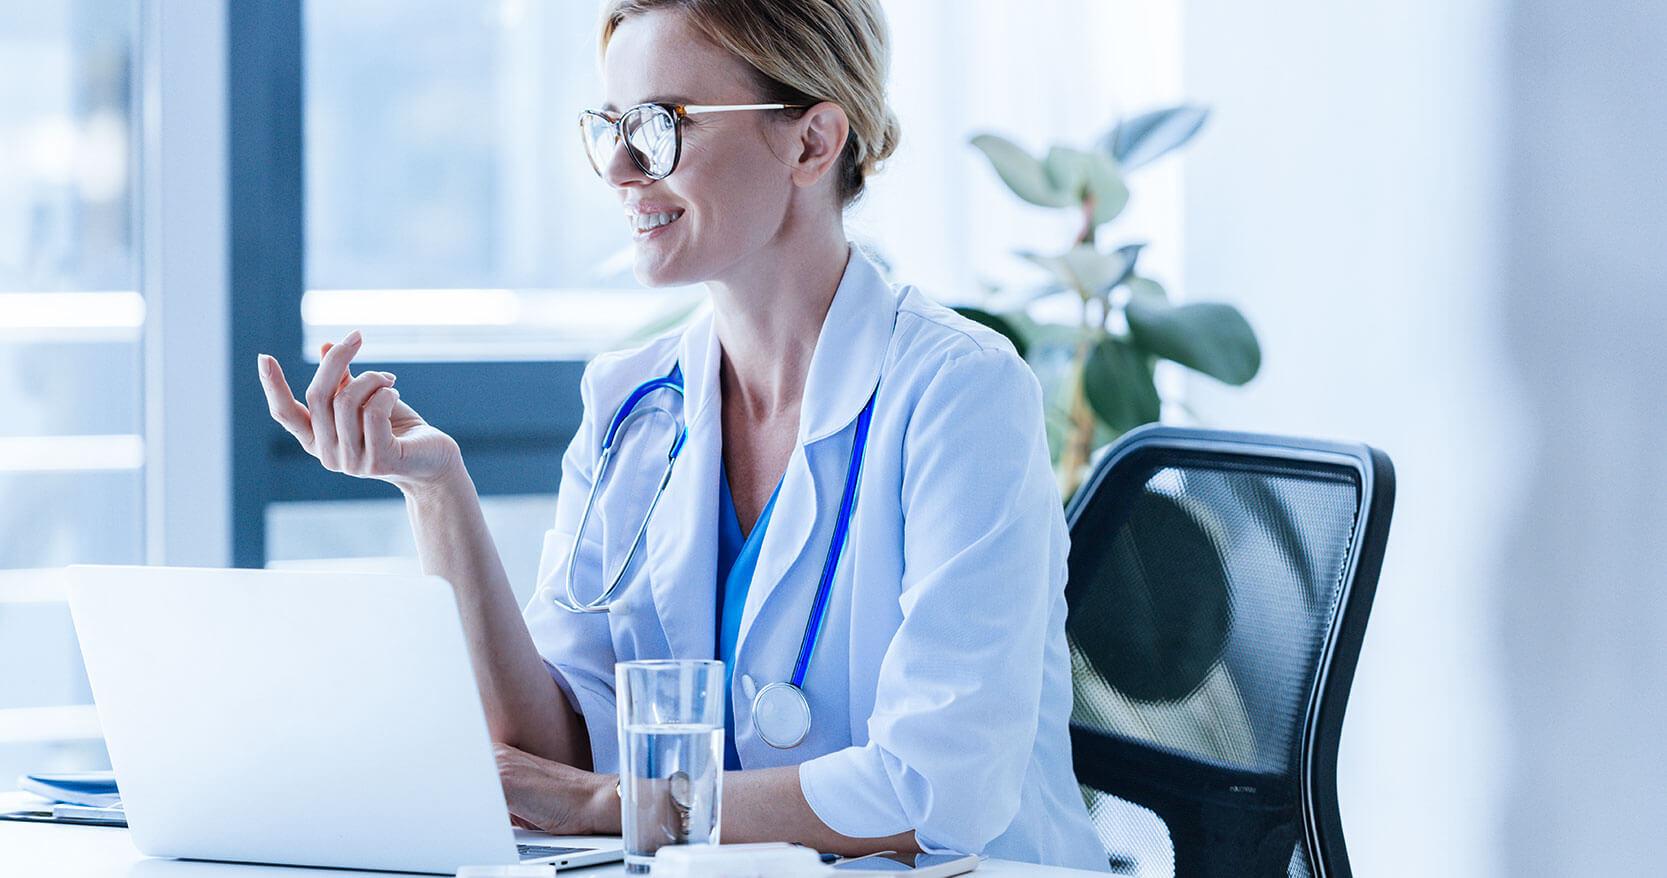 diminuir custos com iClinic